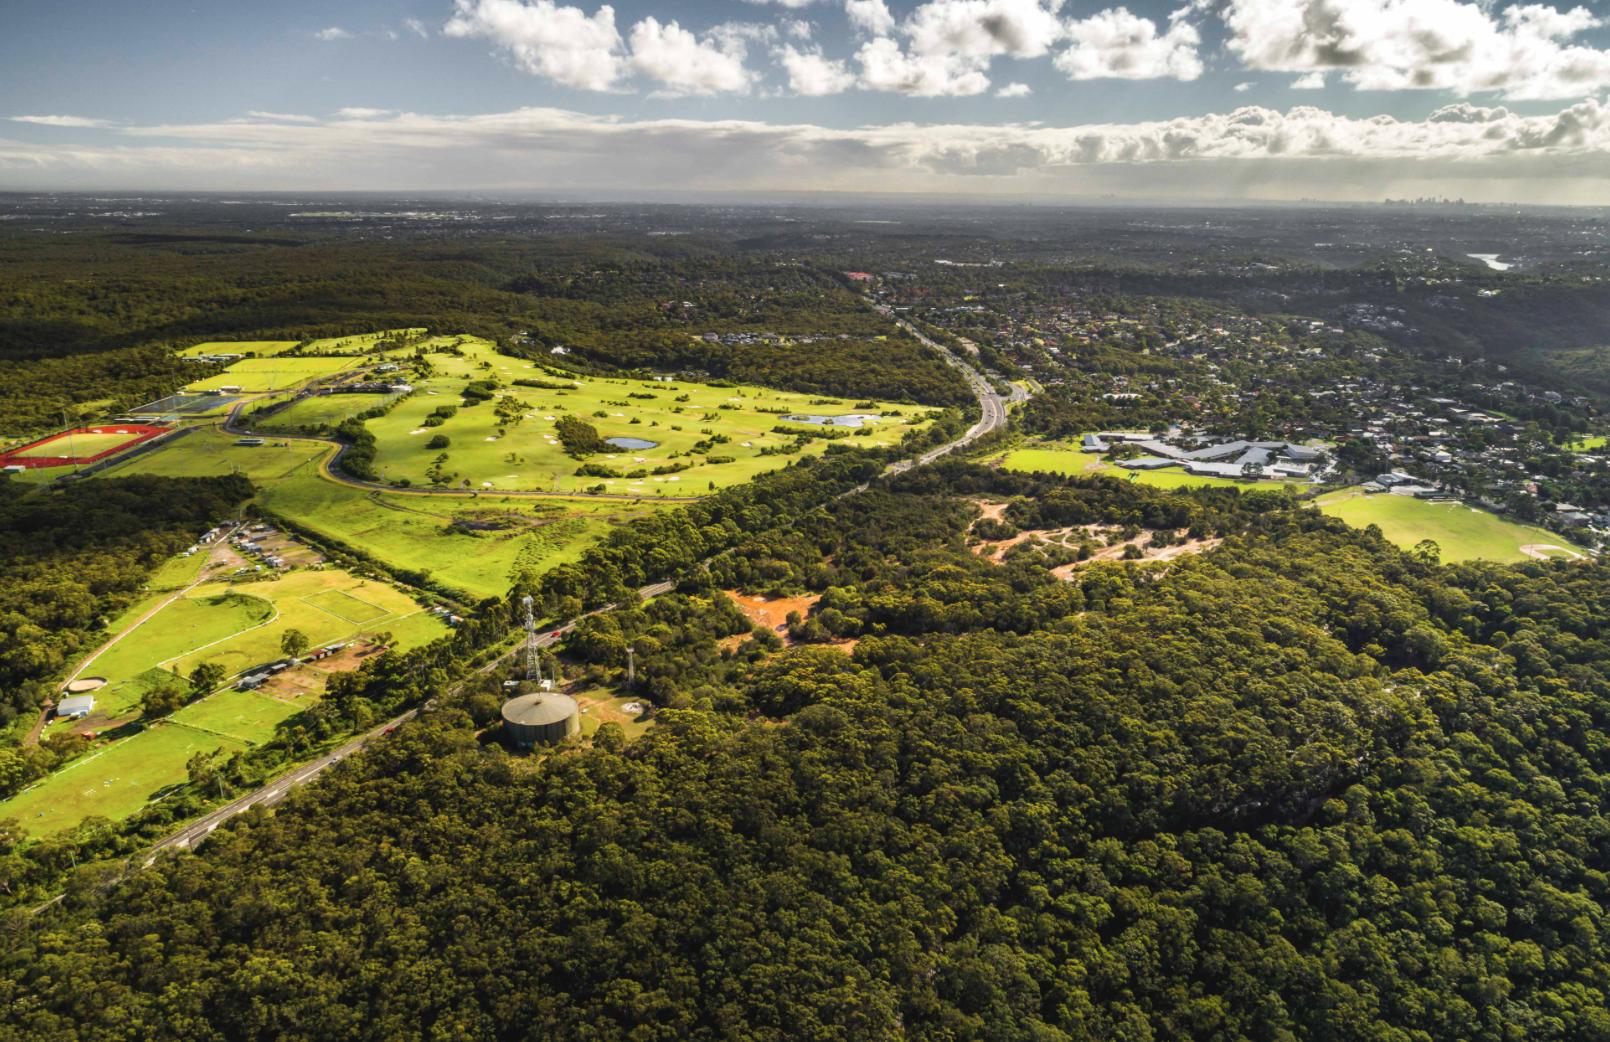 The Ridgeway greenfield development at Sutherland Shire